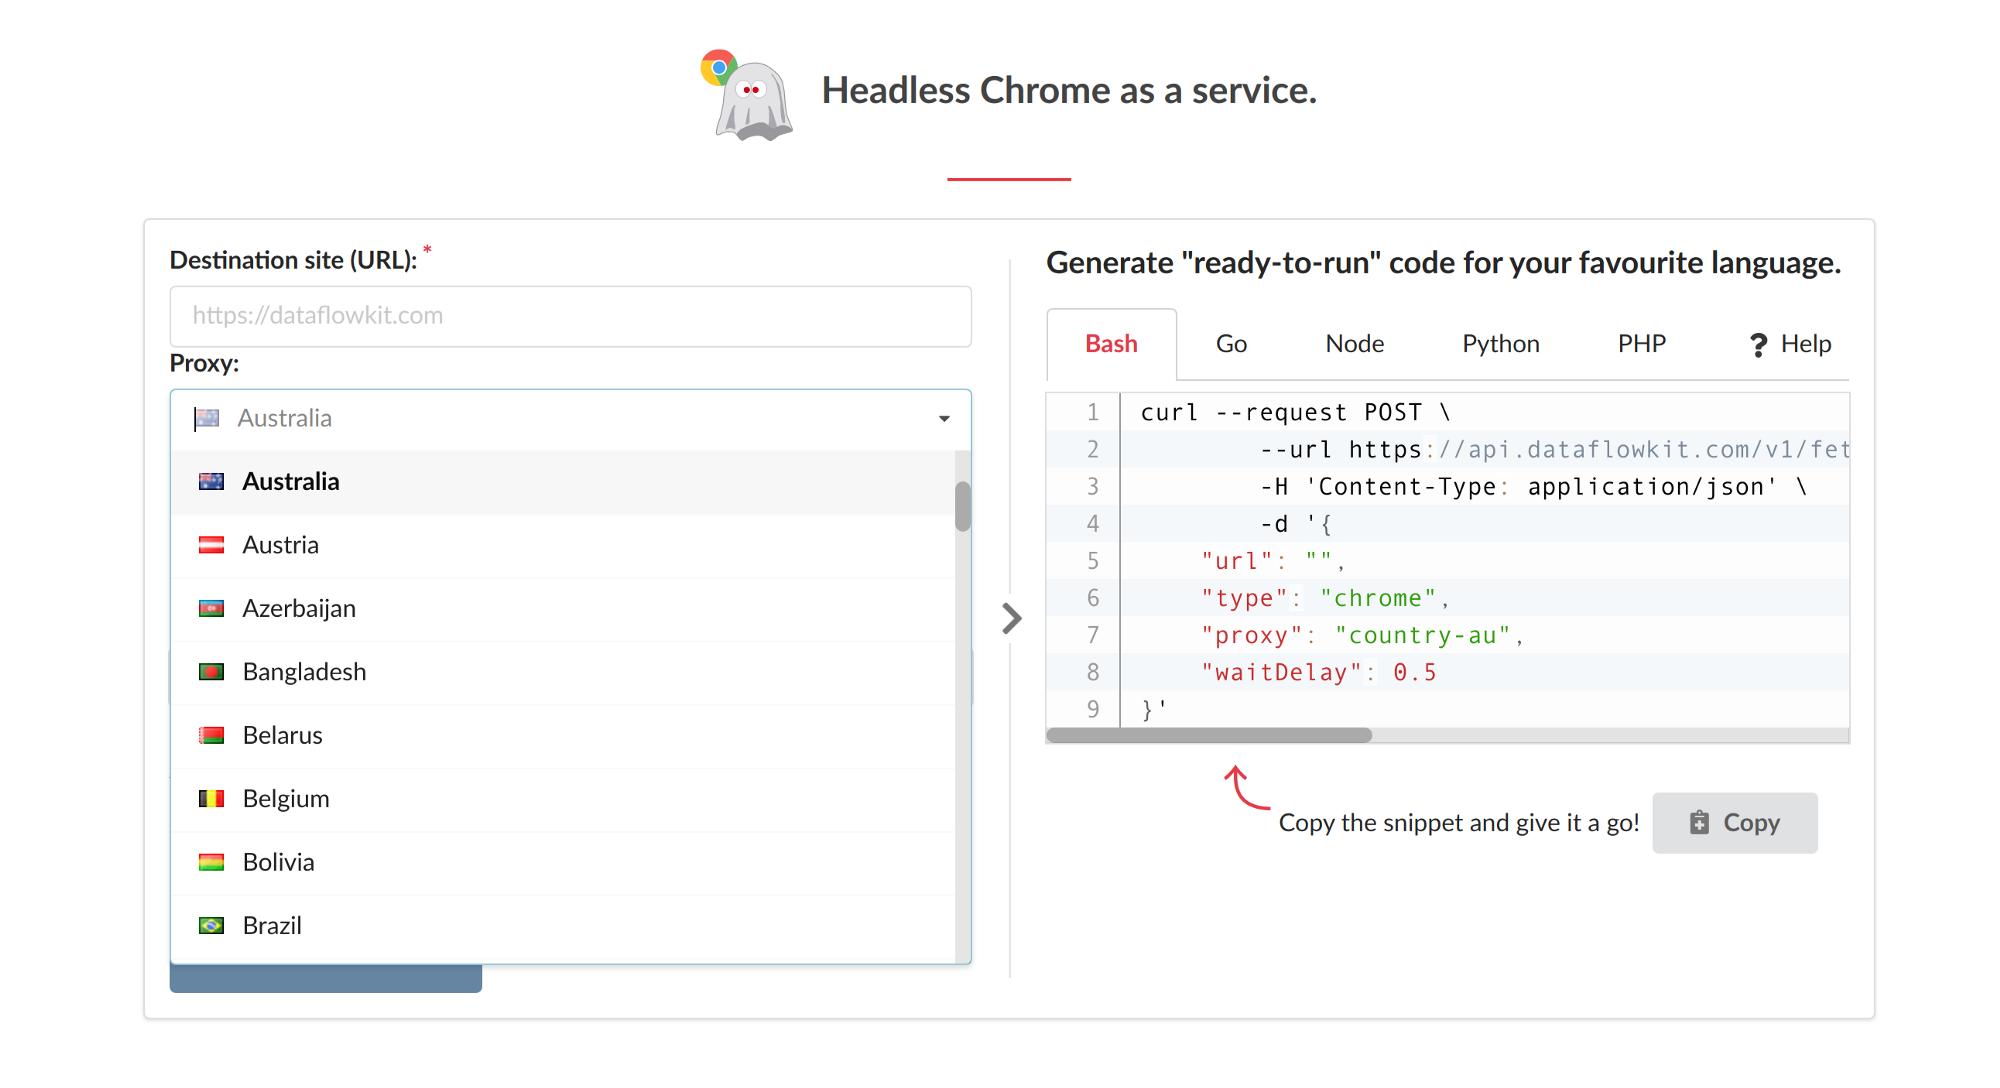 Headless Chrome as a service